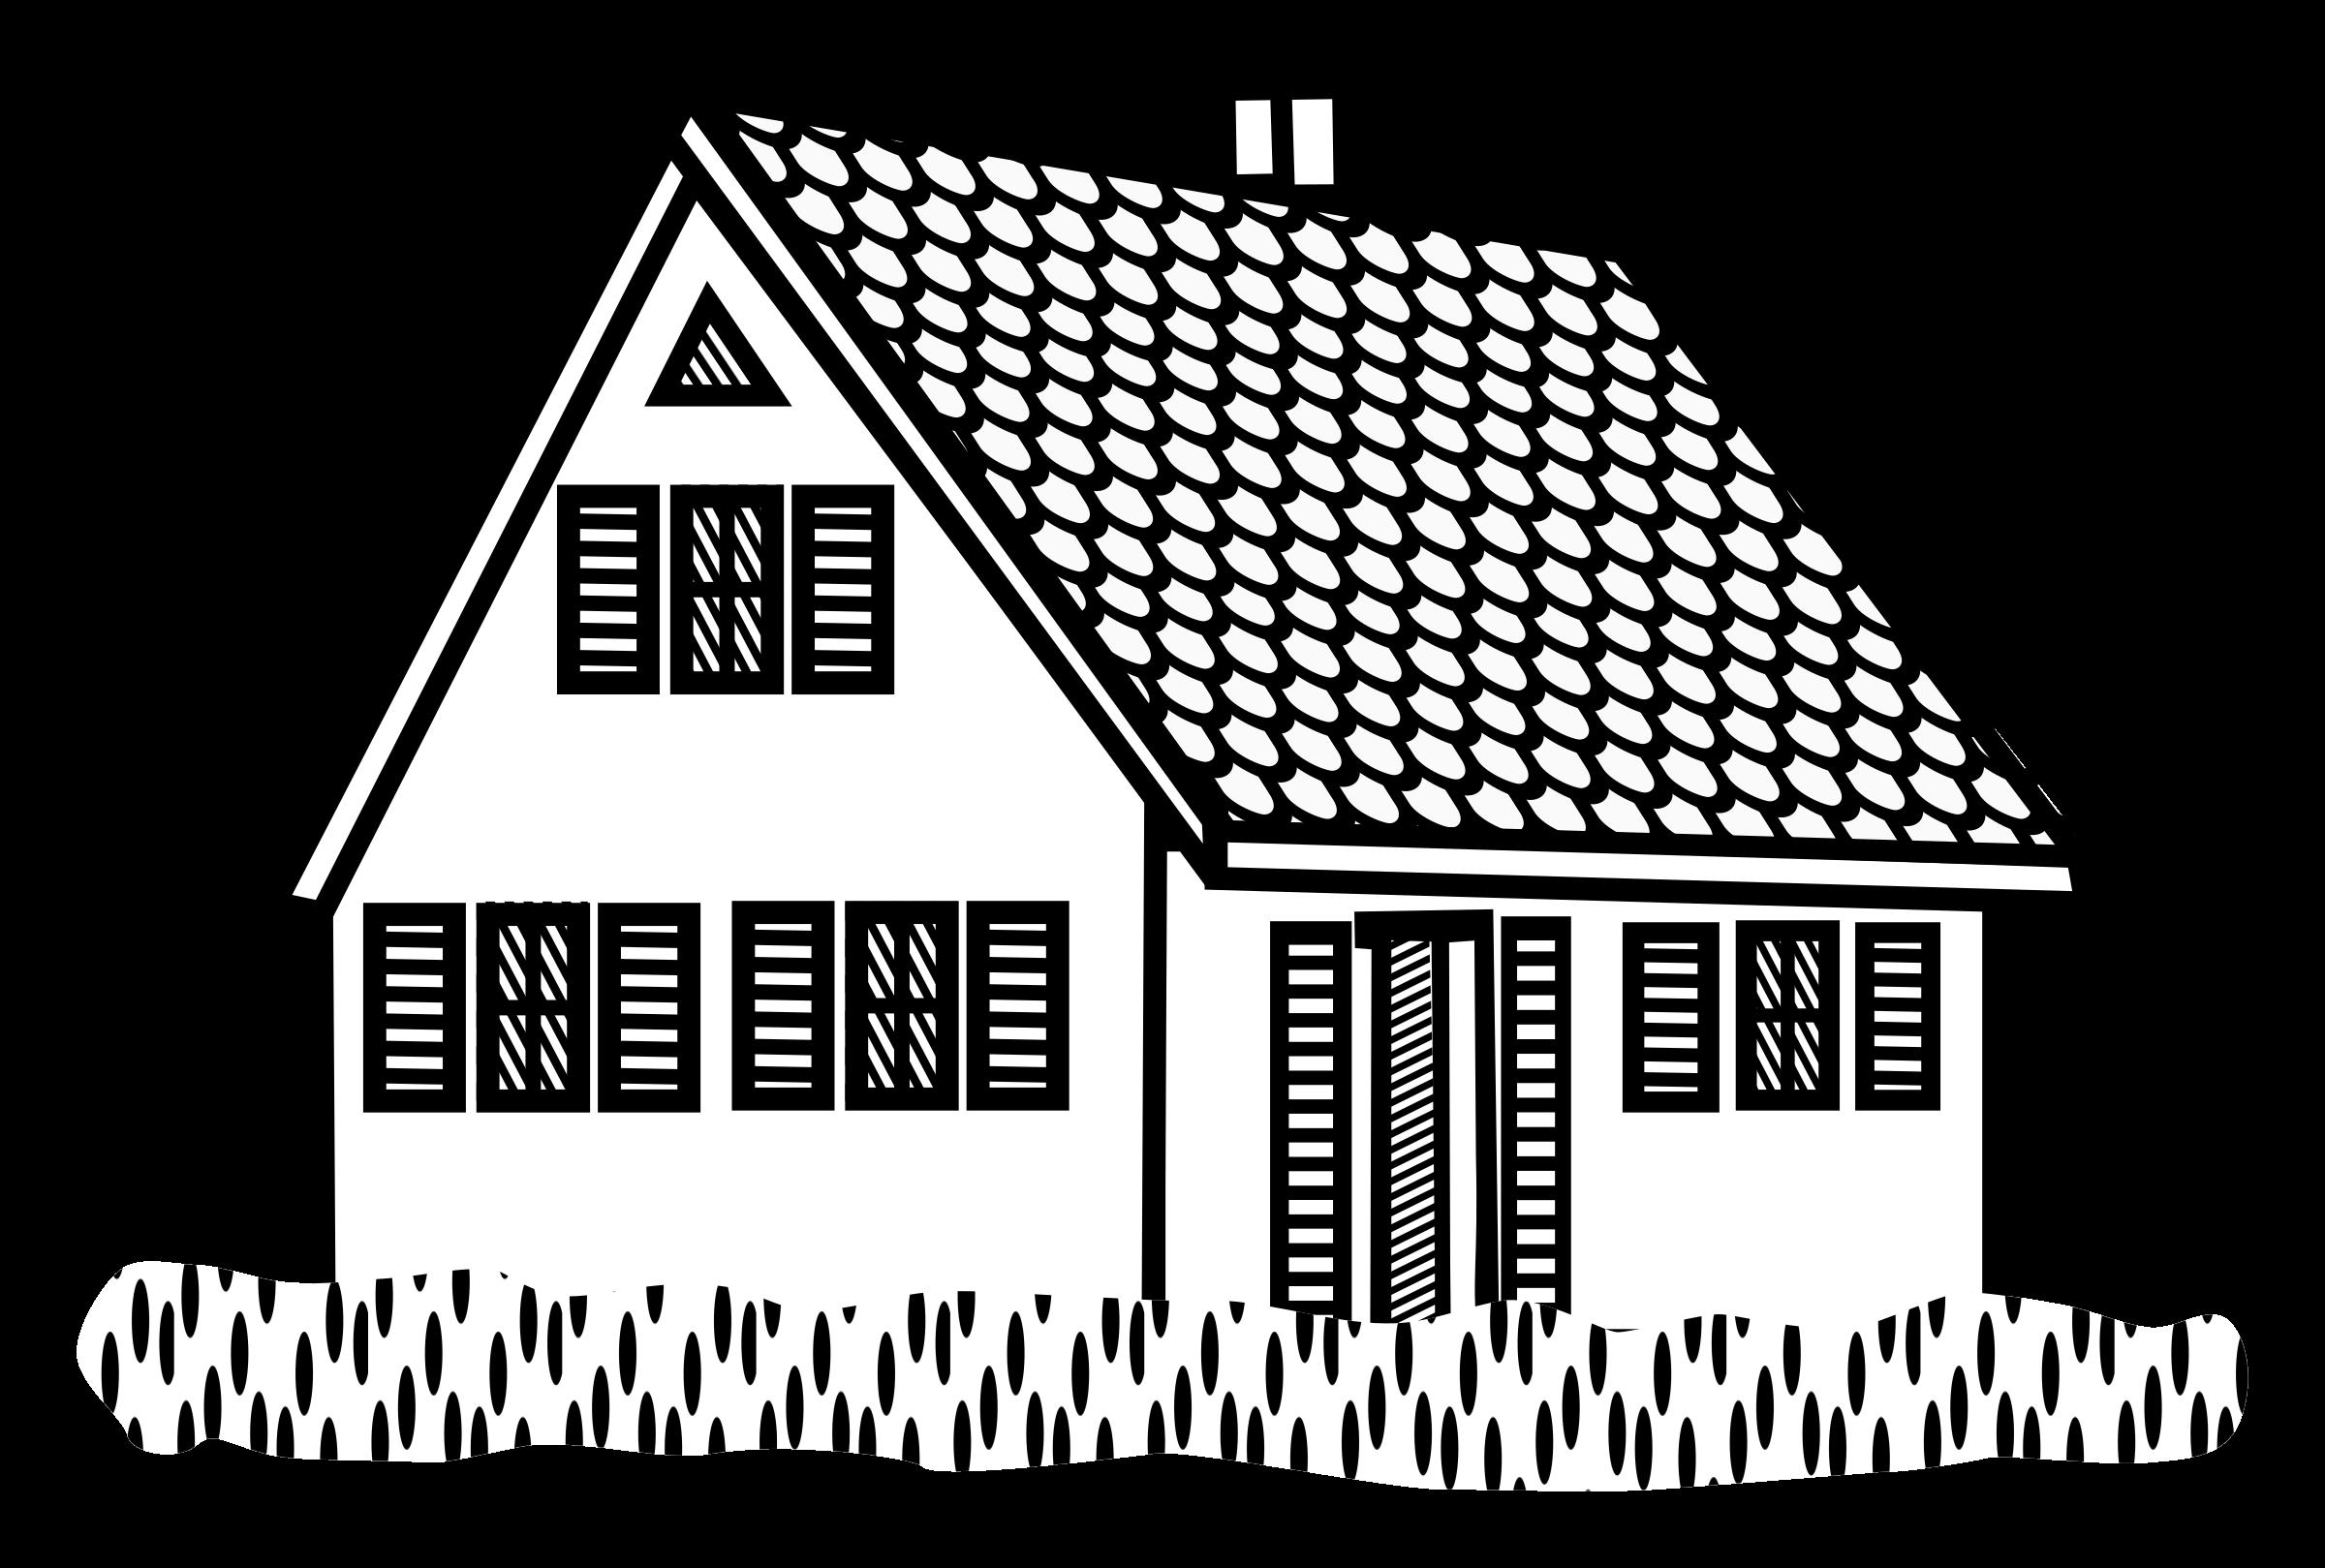 Cottage clipart line art. House lineart big image